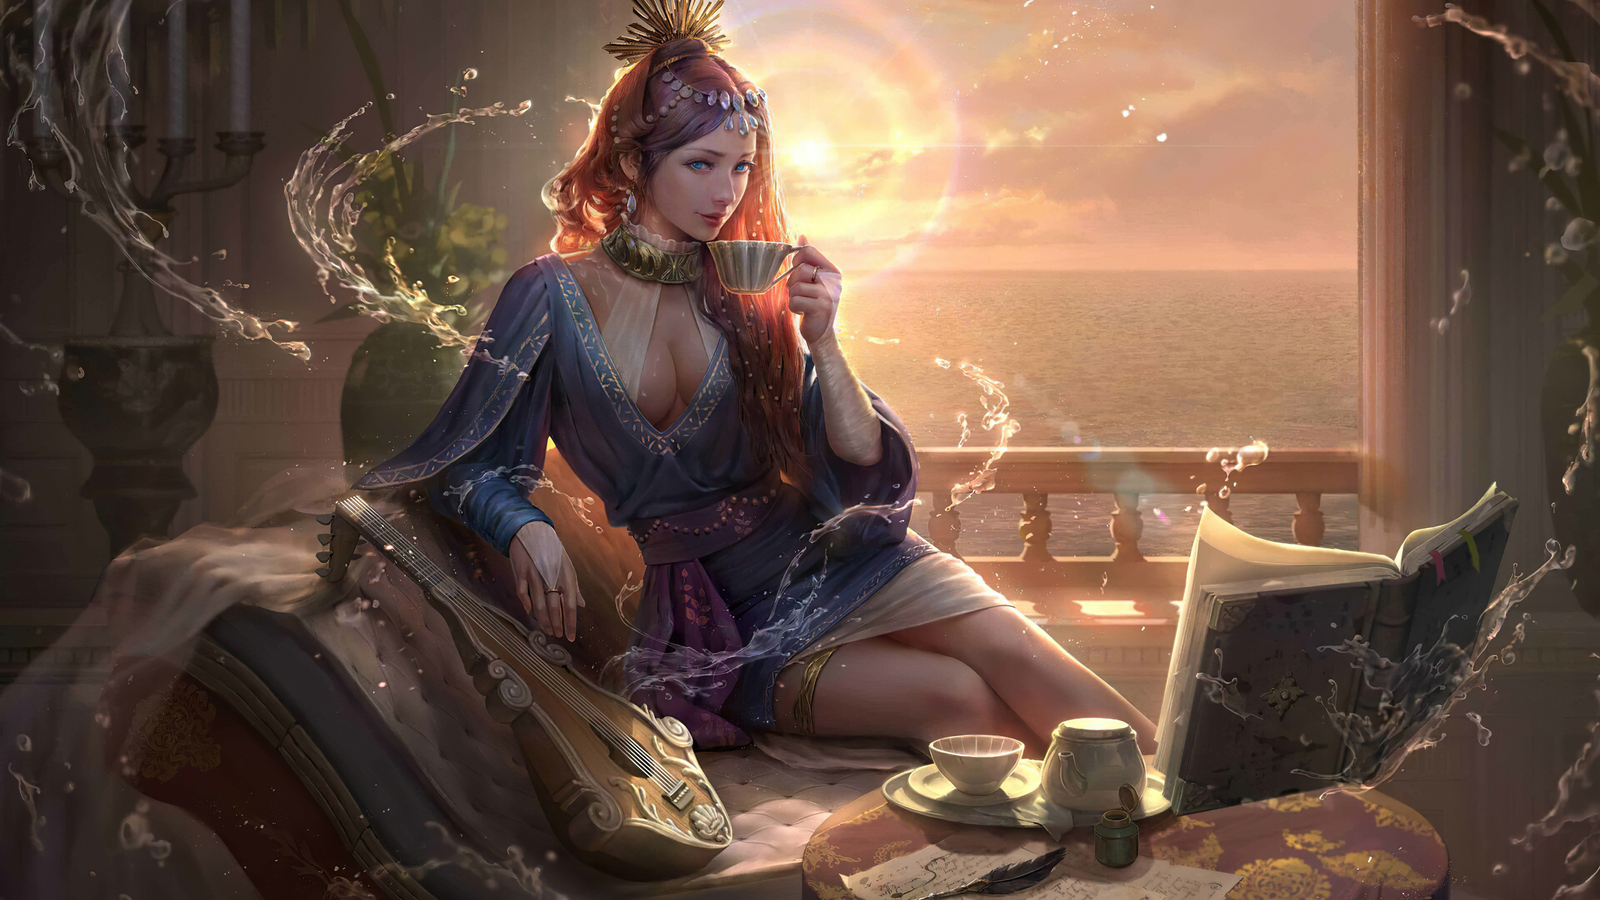 queen-morning-coffee-fantasy-4k-dc.jpg